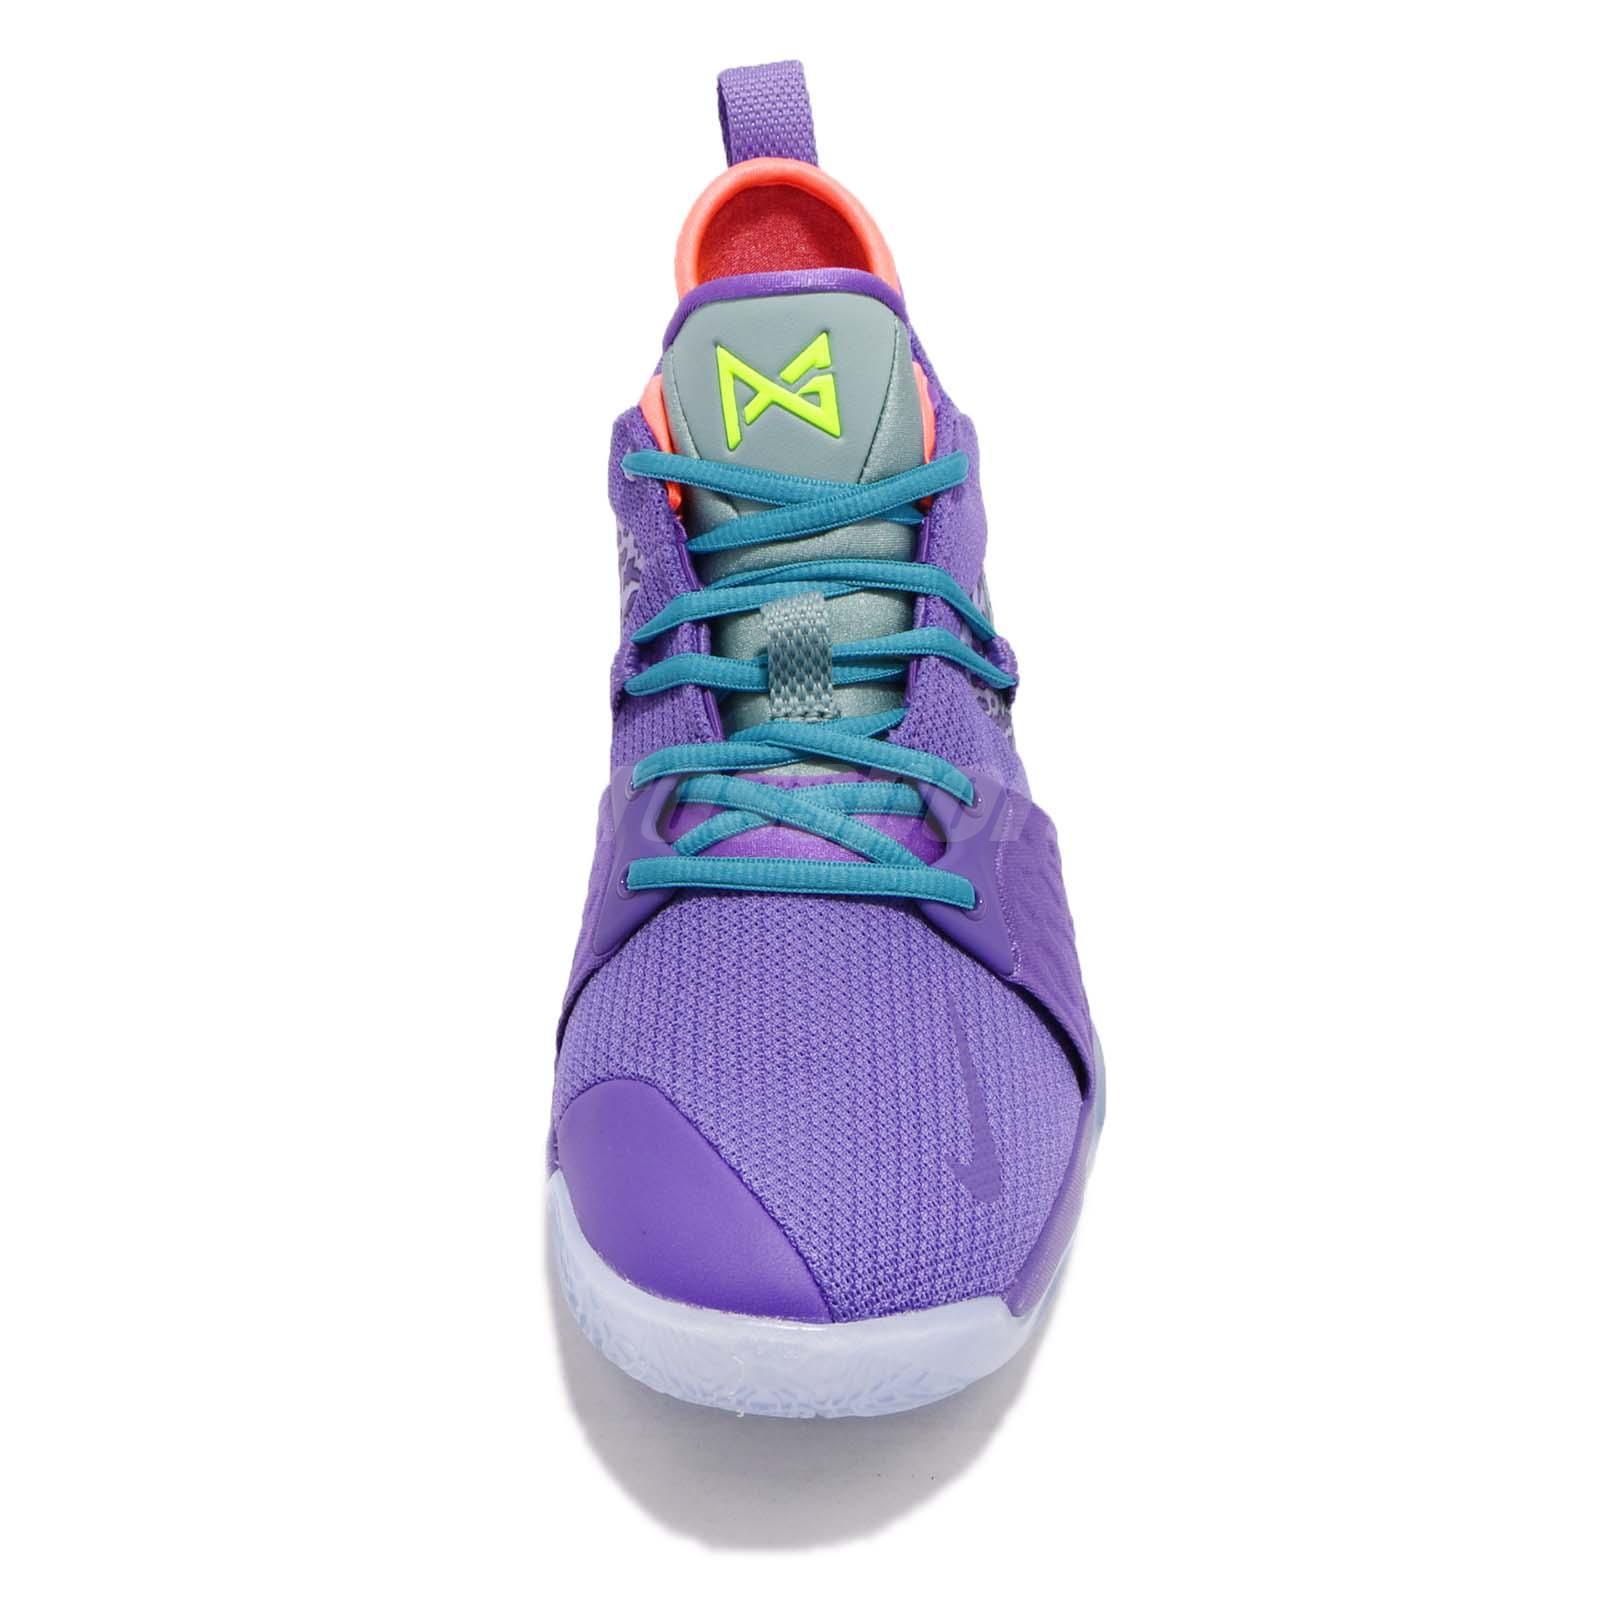 84e1469ef24 Nike PG 2 MM EP II Paul George Mamba Mentality Purple Men Basketball ...